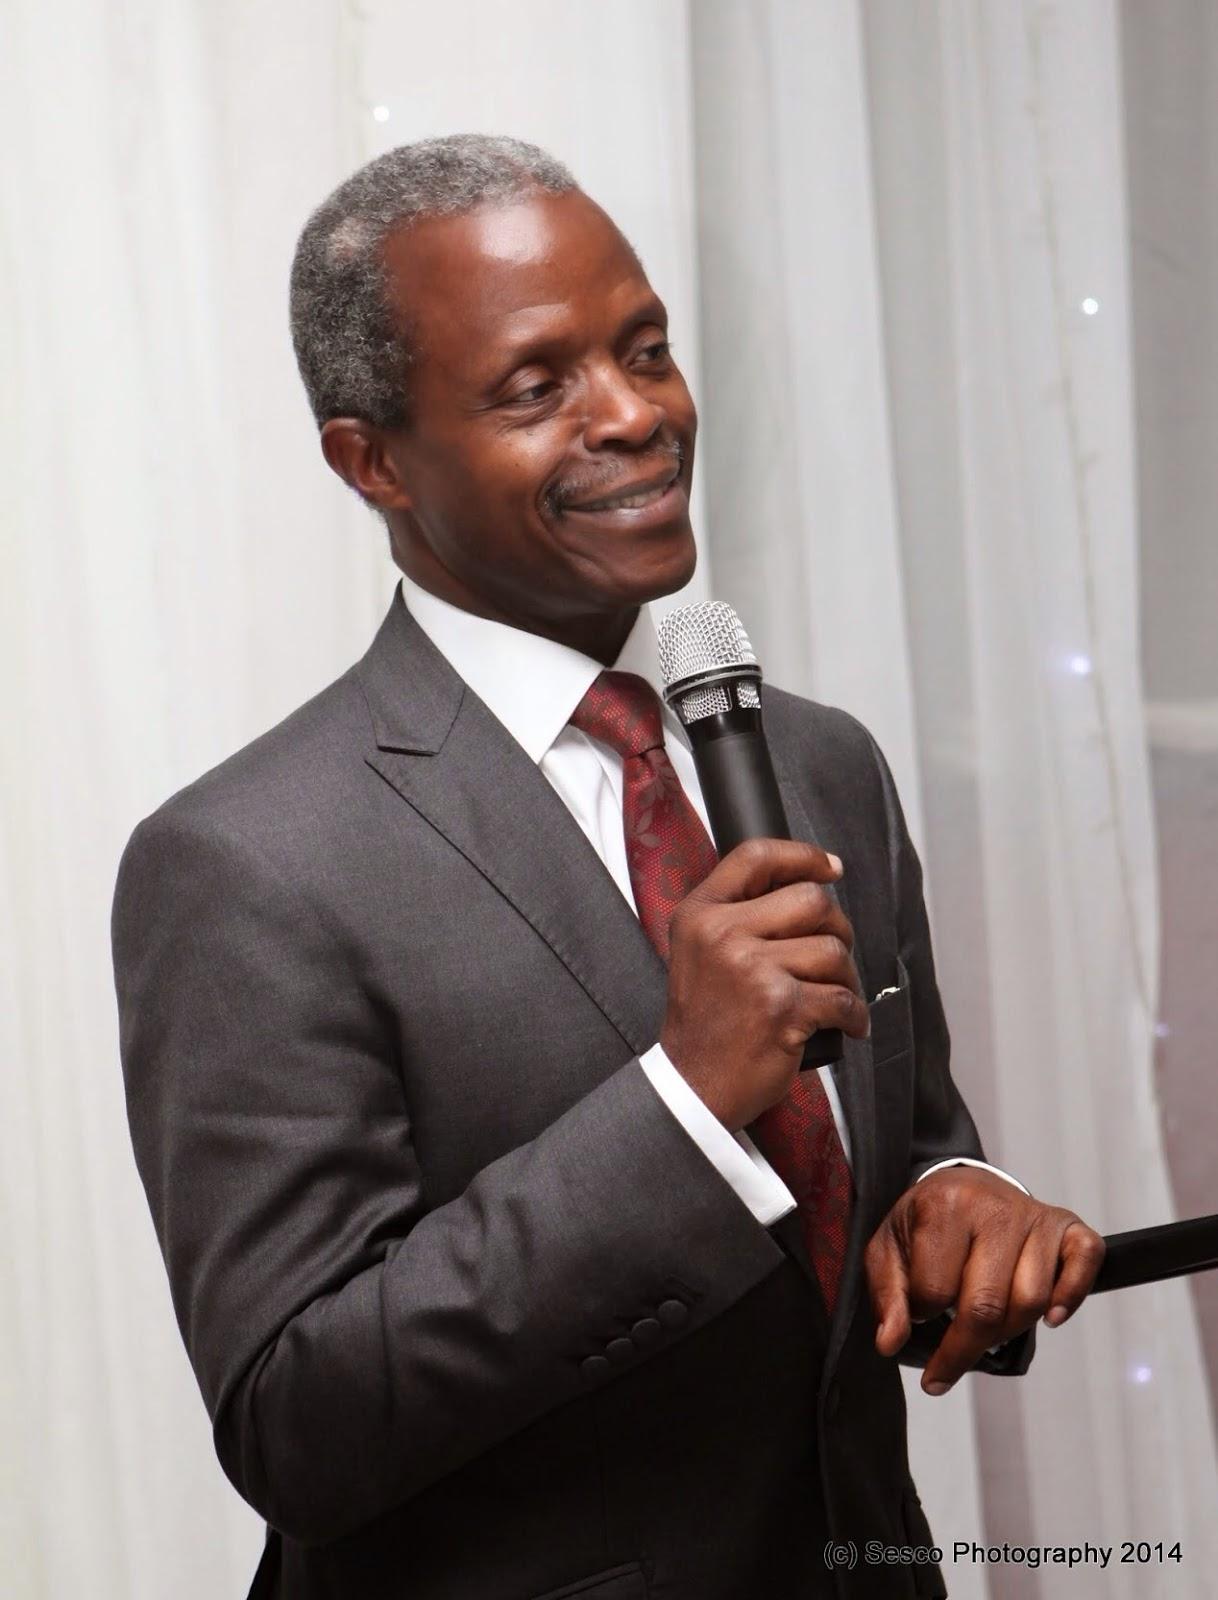 New Technology Council Underway- VP Osinbajo